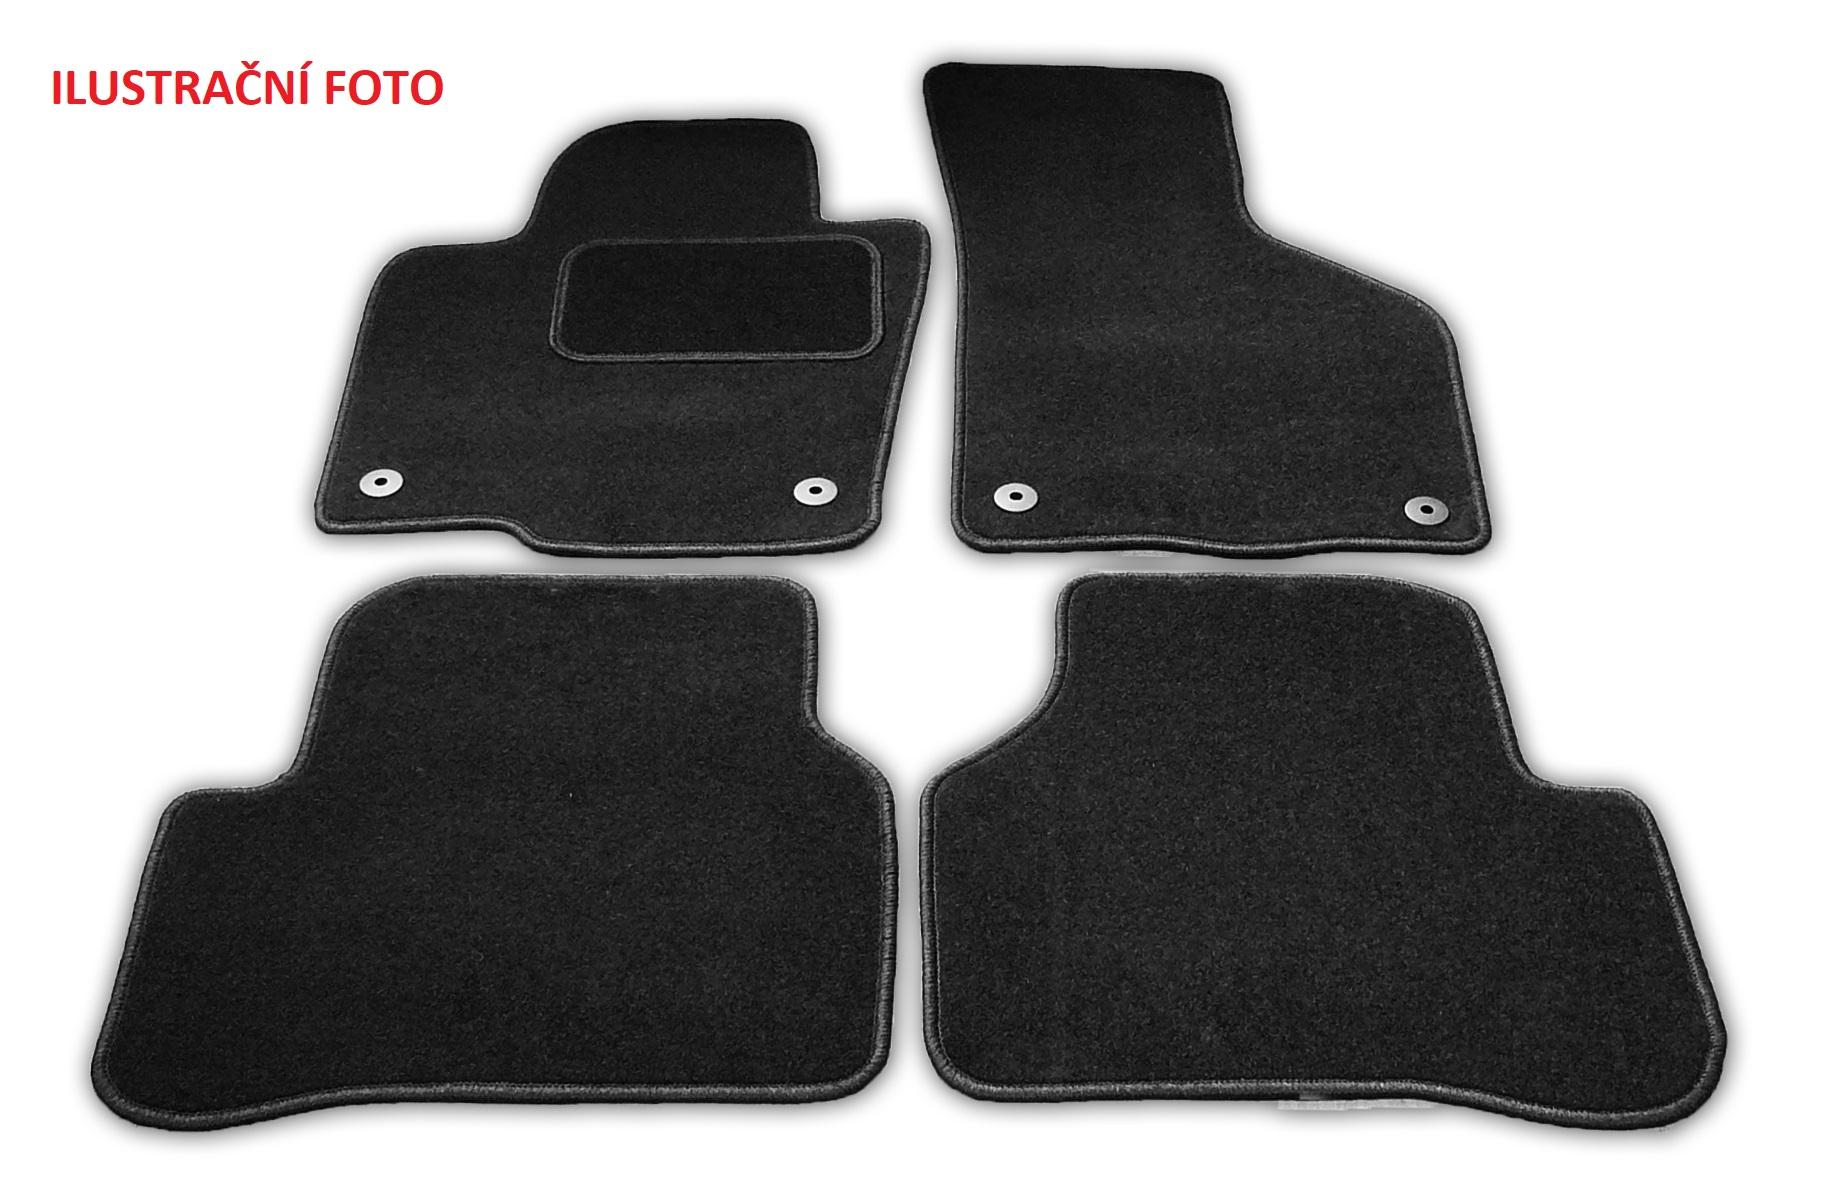 Automega Textilní autokoberce Standard Citroen Xsara Picasso 2000-